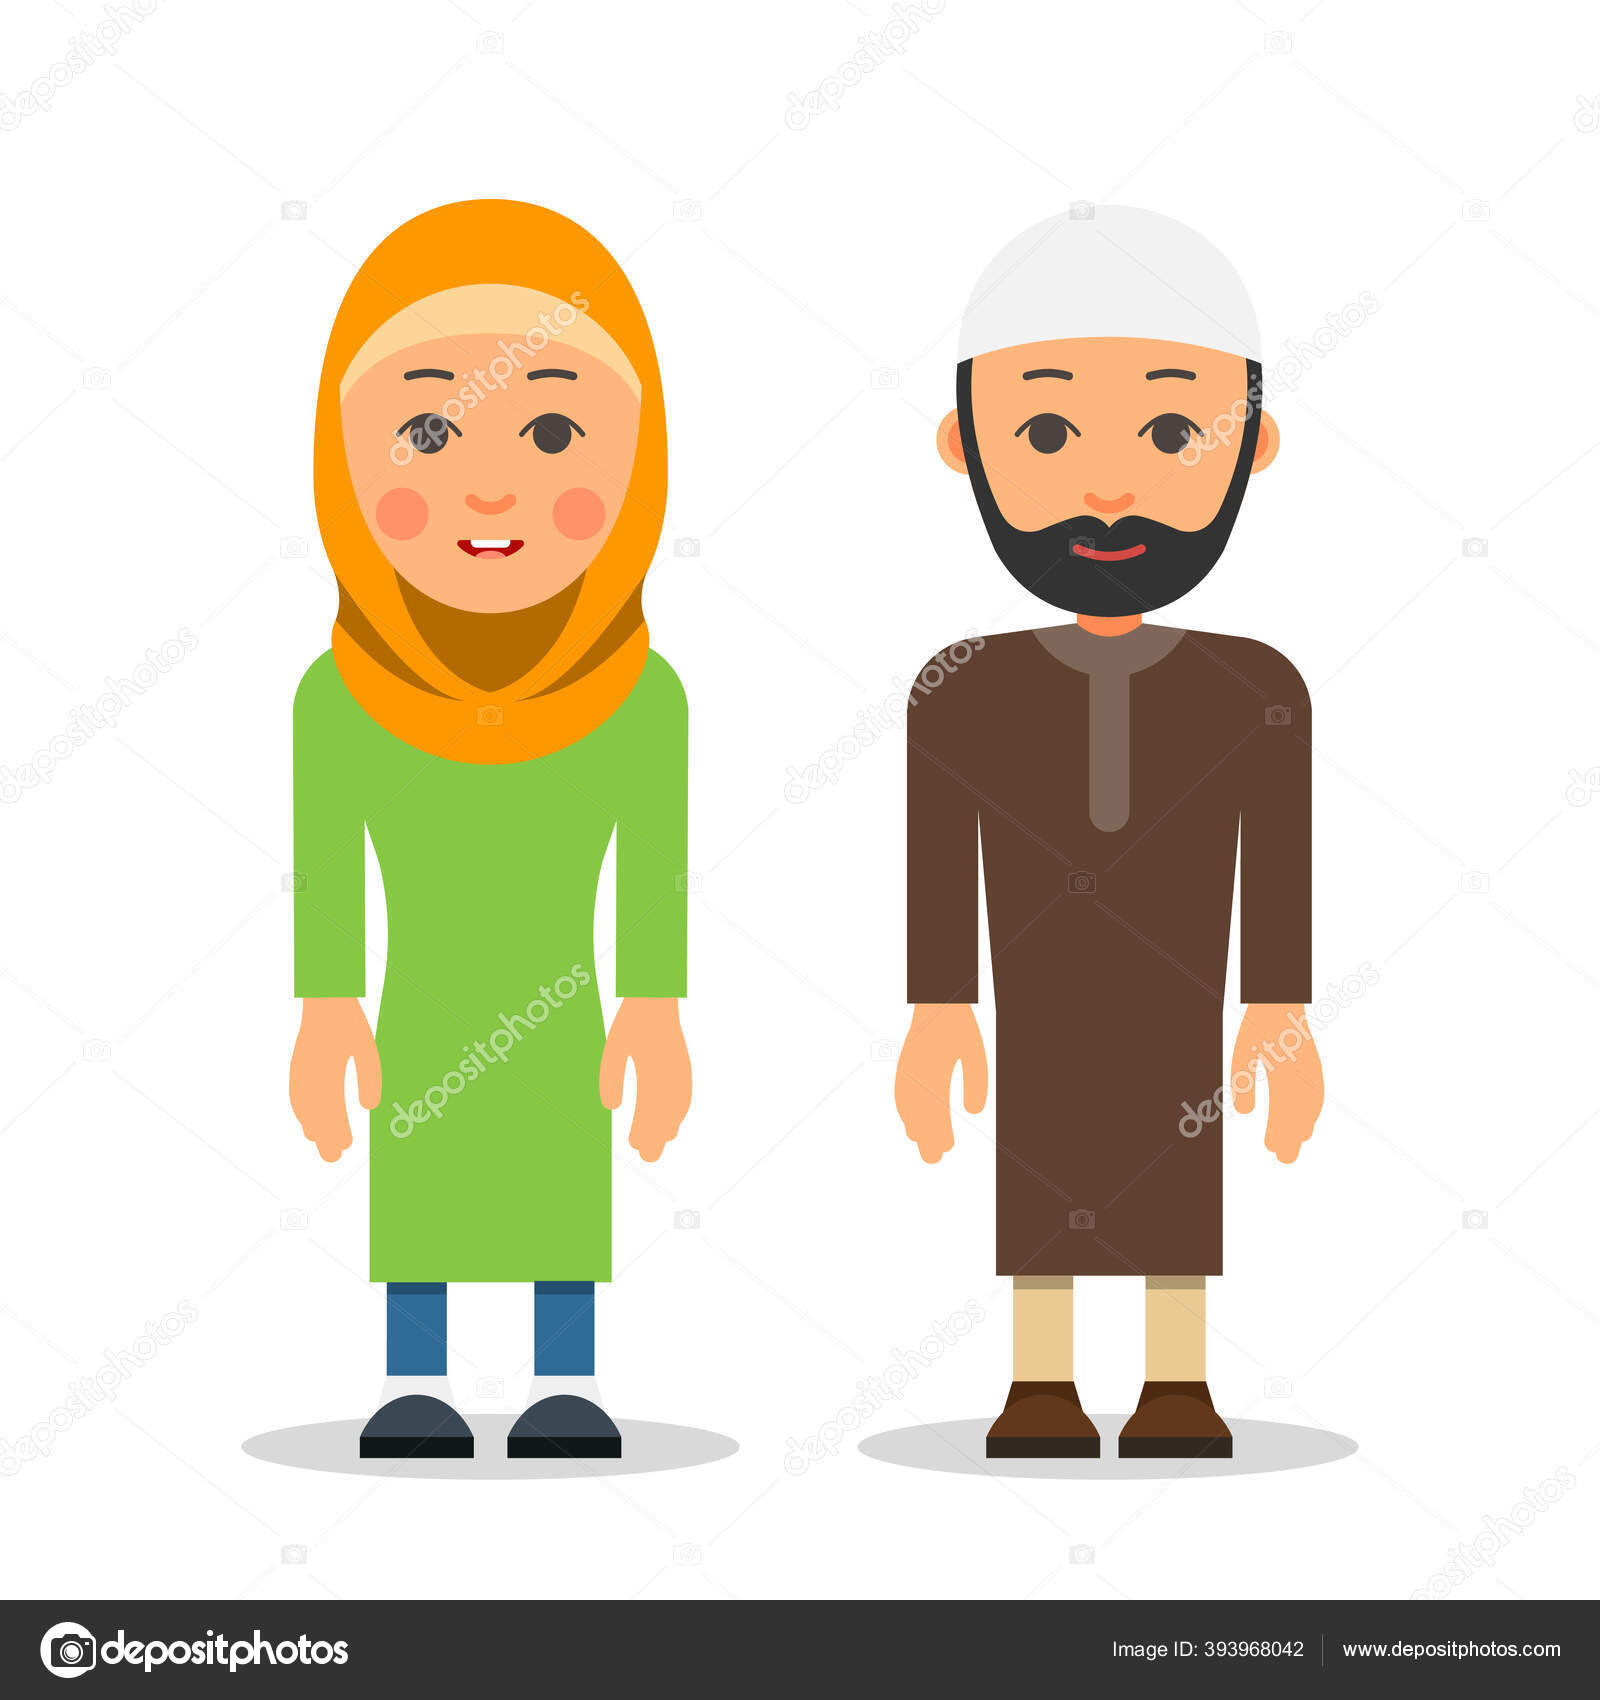 Gambar Kartun Wanita Pria Muslim Arab Muslim Couple Woman Man Stand Together Traditional Clothing Isolated Stock Vector C Jeysent 393968042